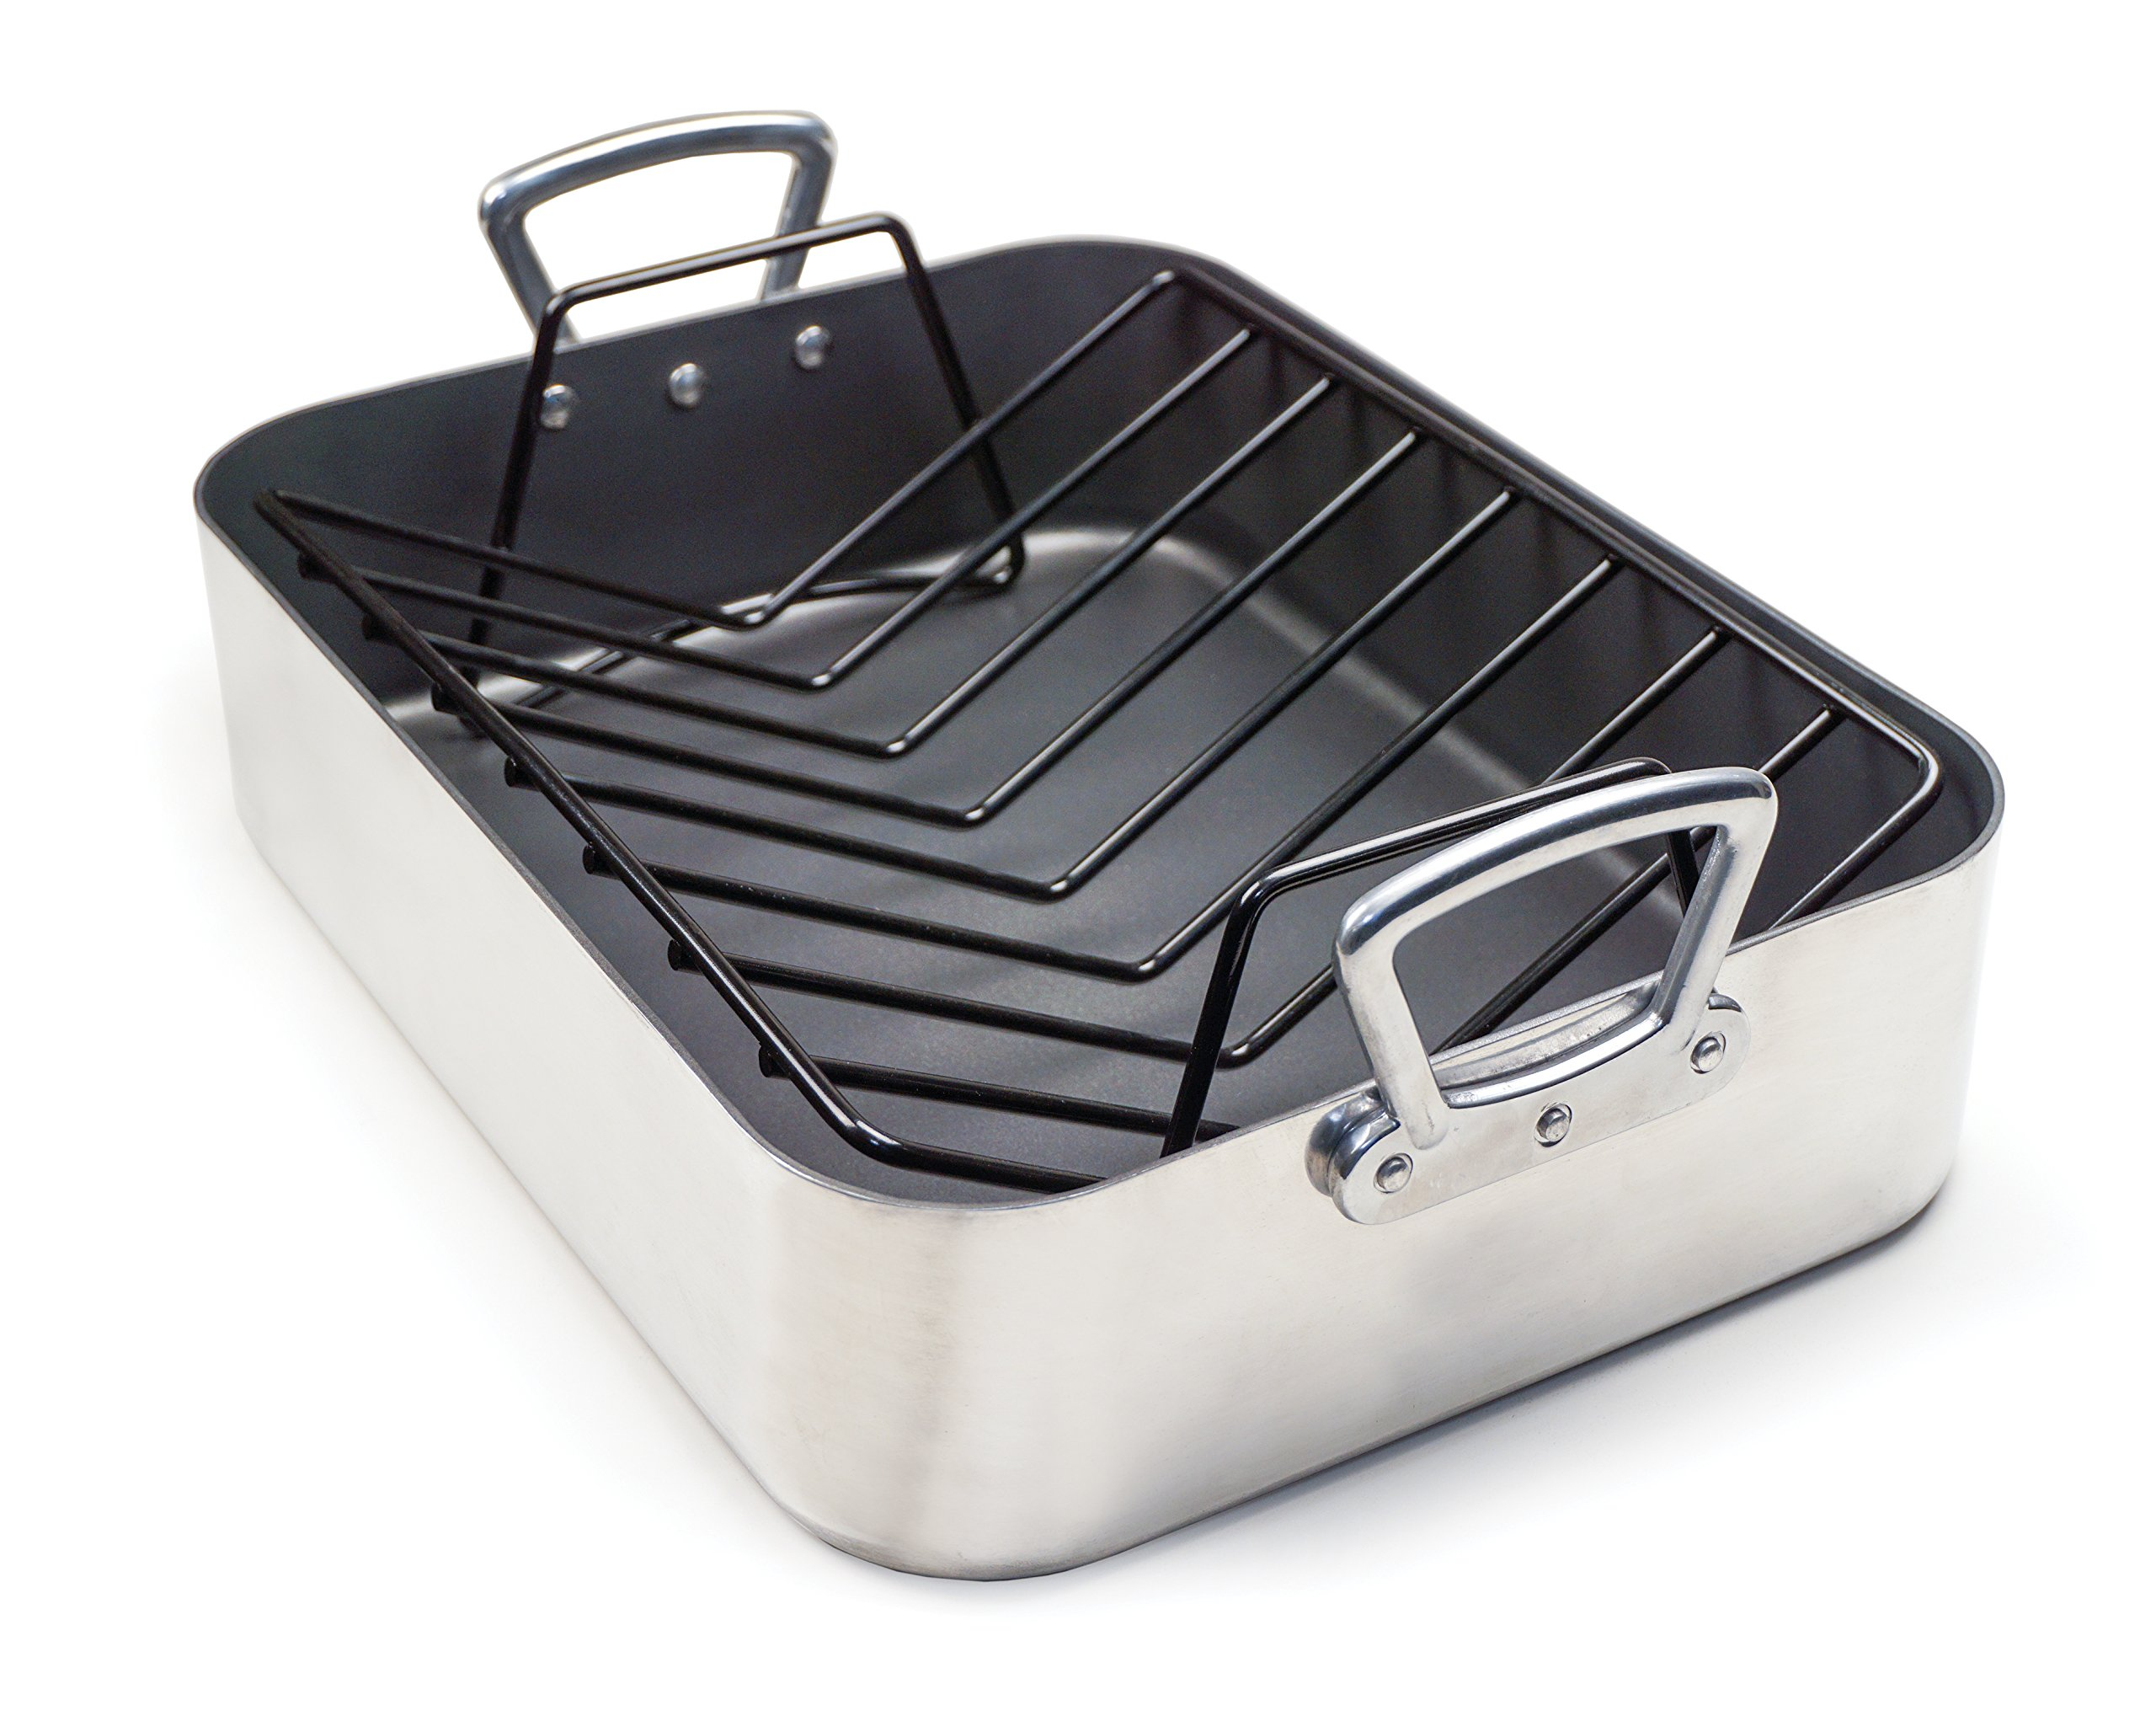 RSVP International RLP Hercules Roasting & Lasagna Pan, One Size, Multi Color by RSVP International